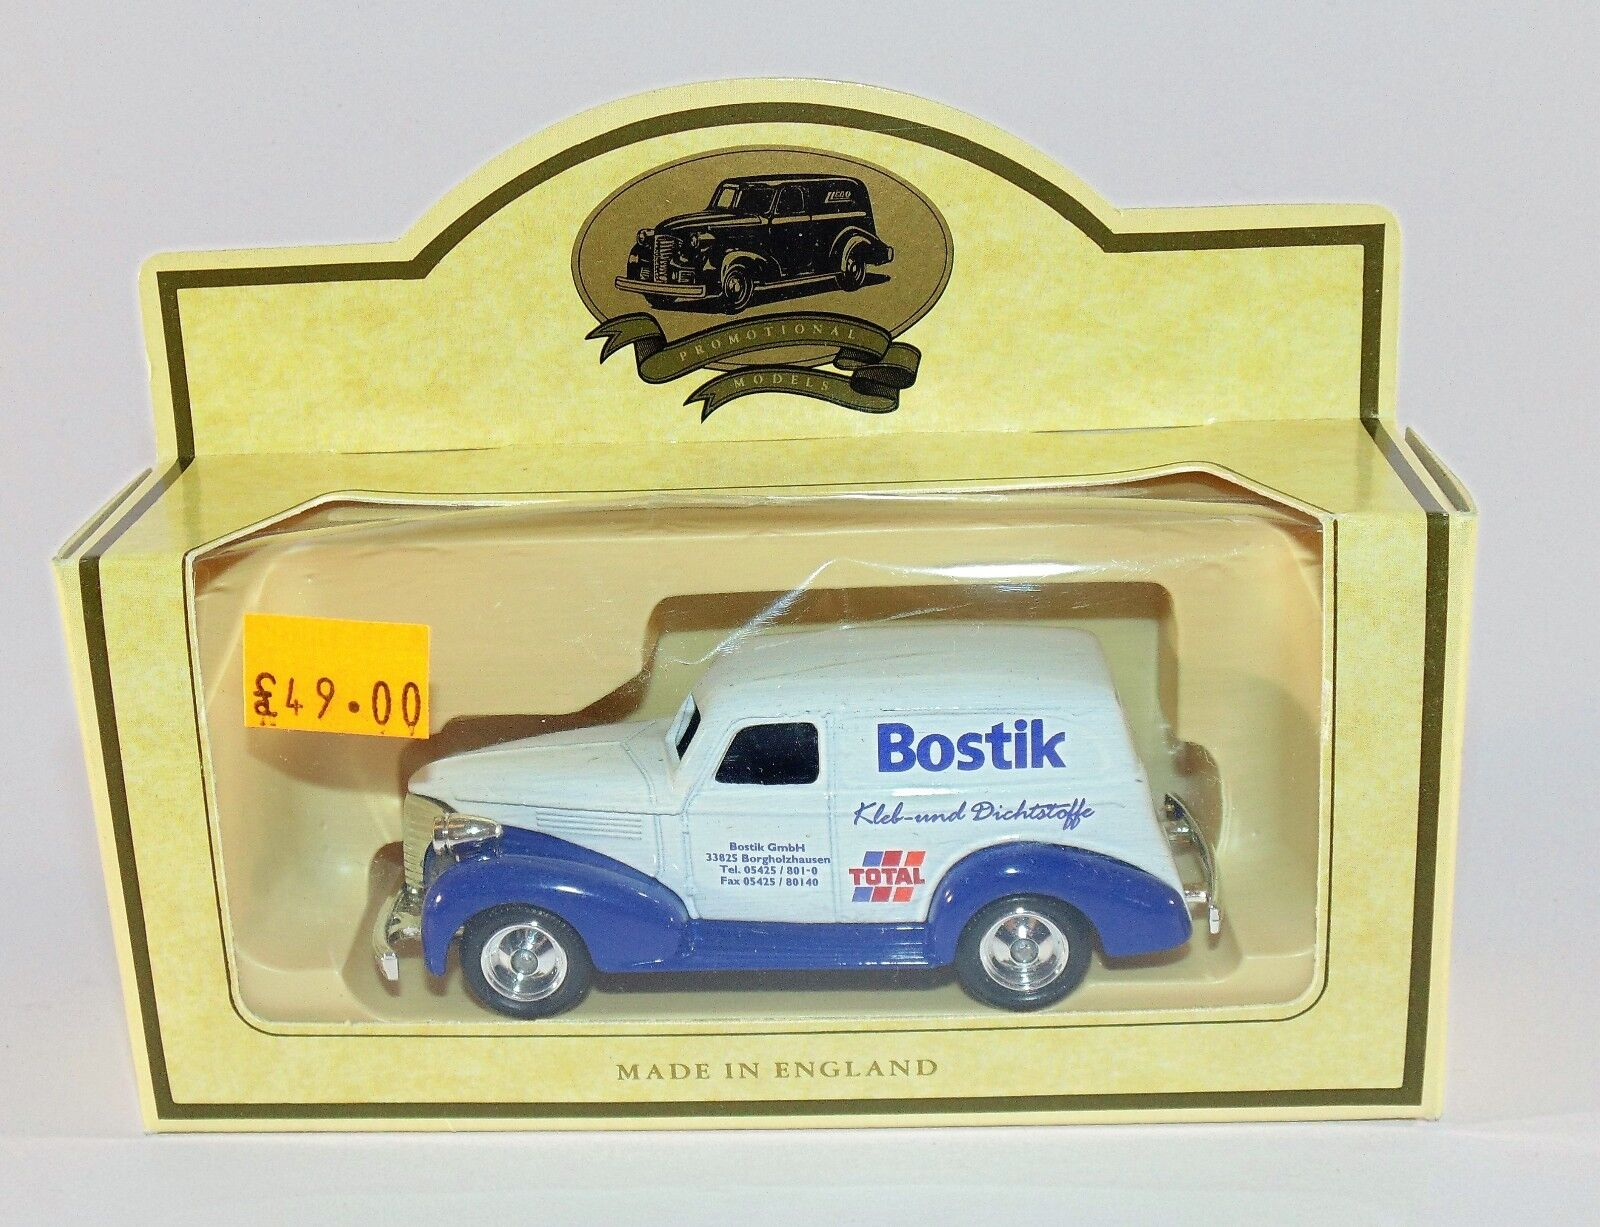 Lledo Promotional Models RARE Bostik GmbH GmbH GmbH Kleb-und Dichtstoffe Total Van 823106